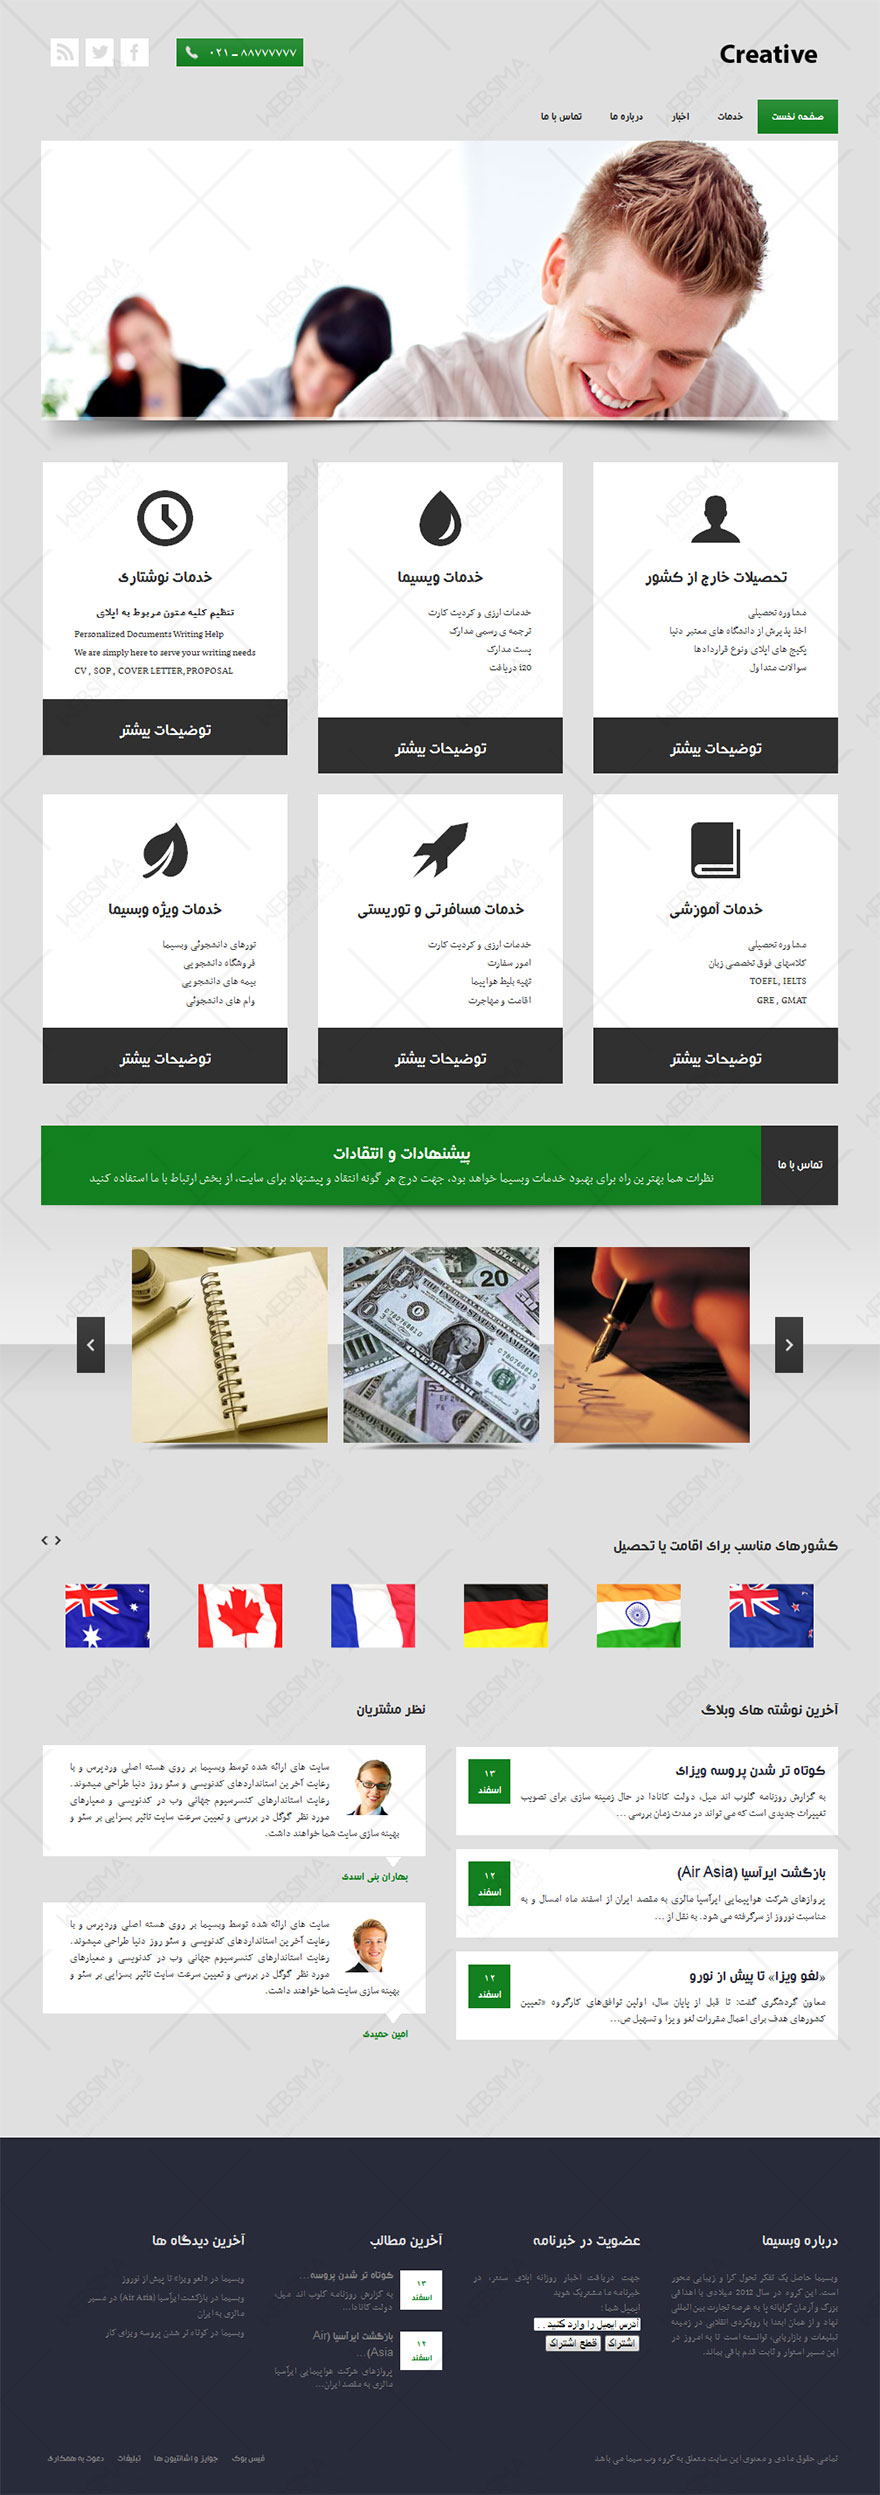 طراحی سایت کریتیو